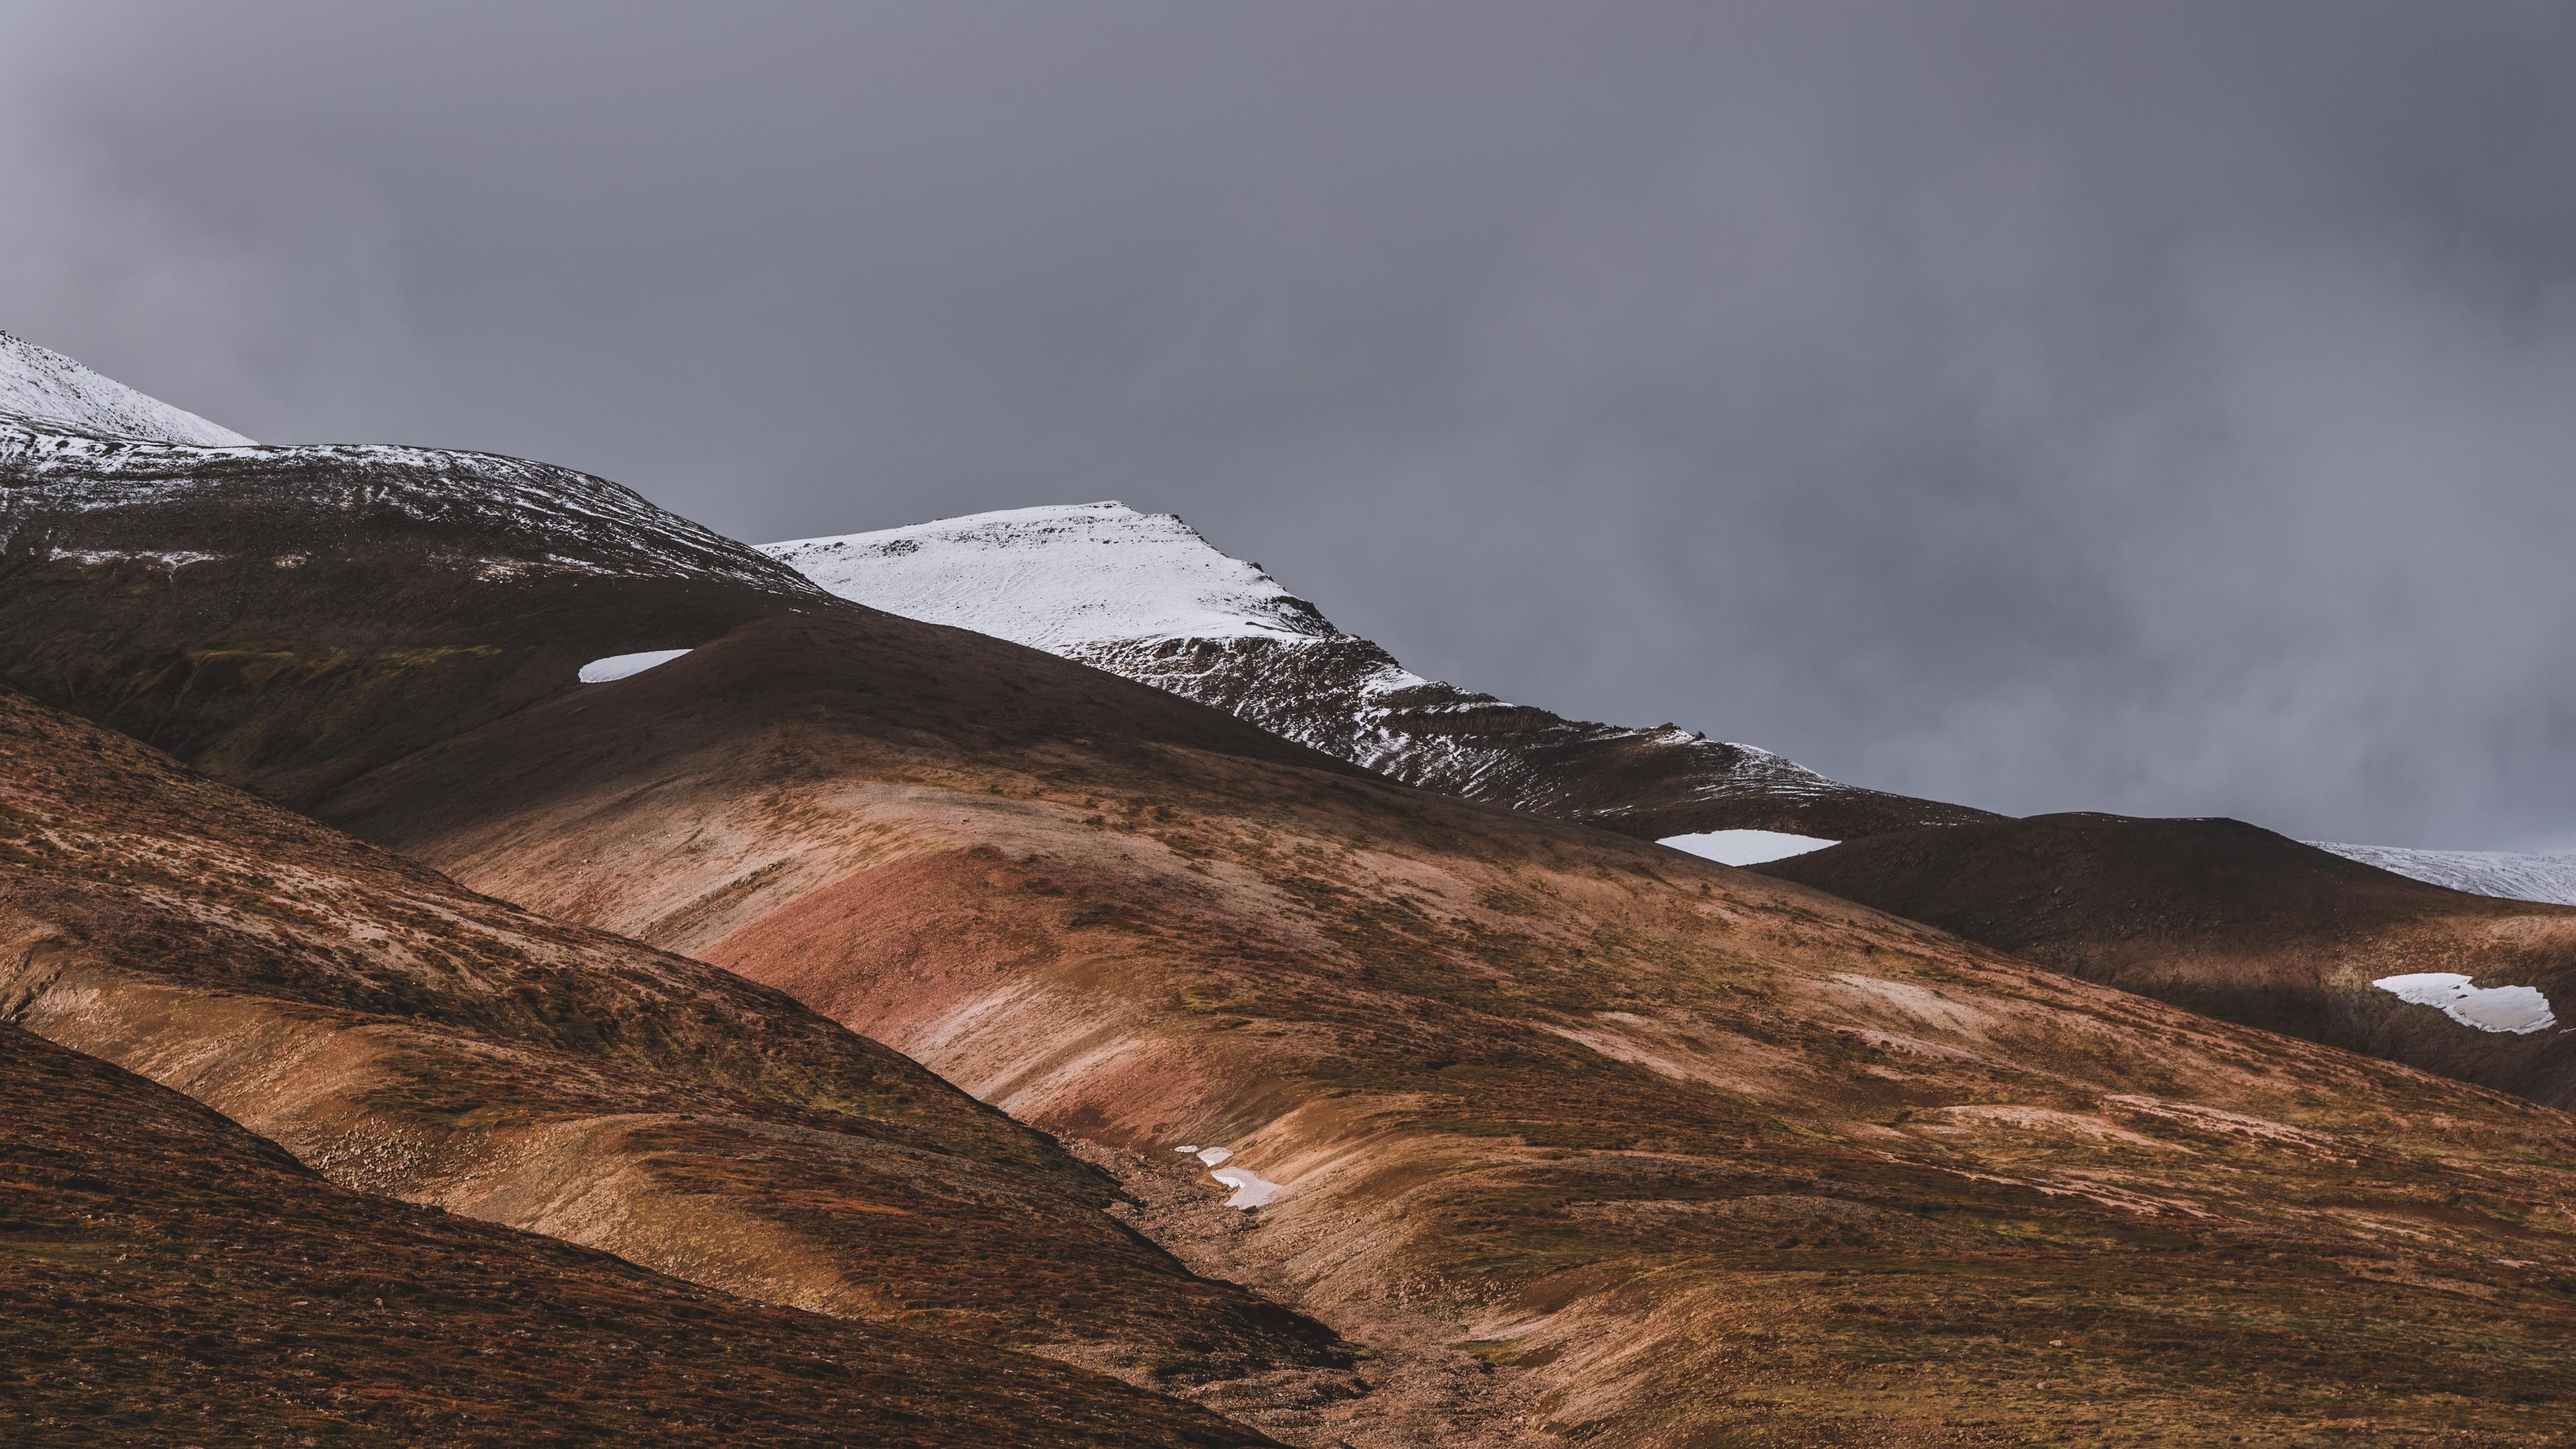 akureyri iceland hills snow sky 4k 1541115077 - akureyri, iceland, hills, snow, sky 4k - Iceland, Hills, akureyri